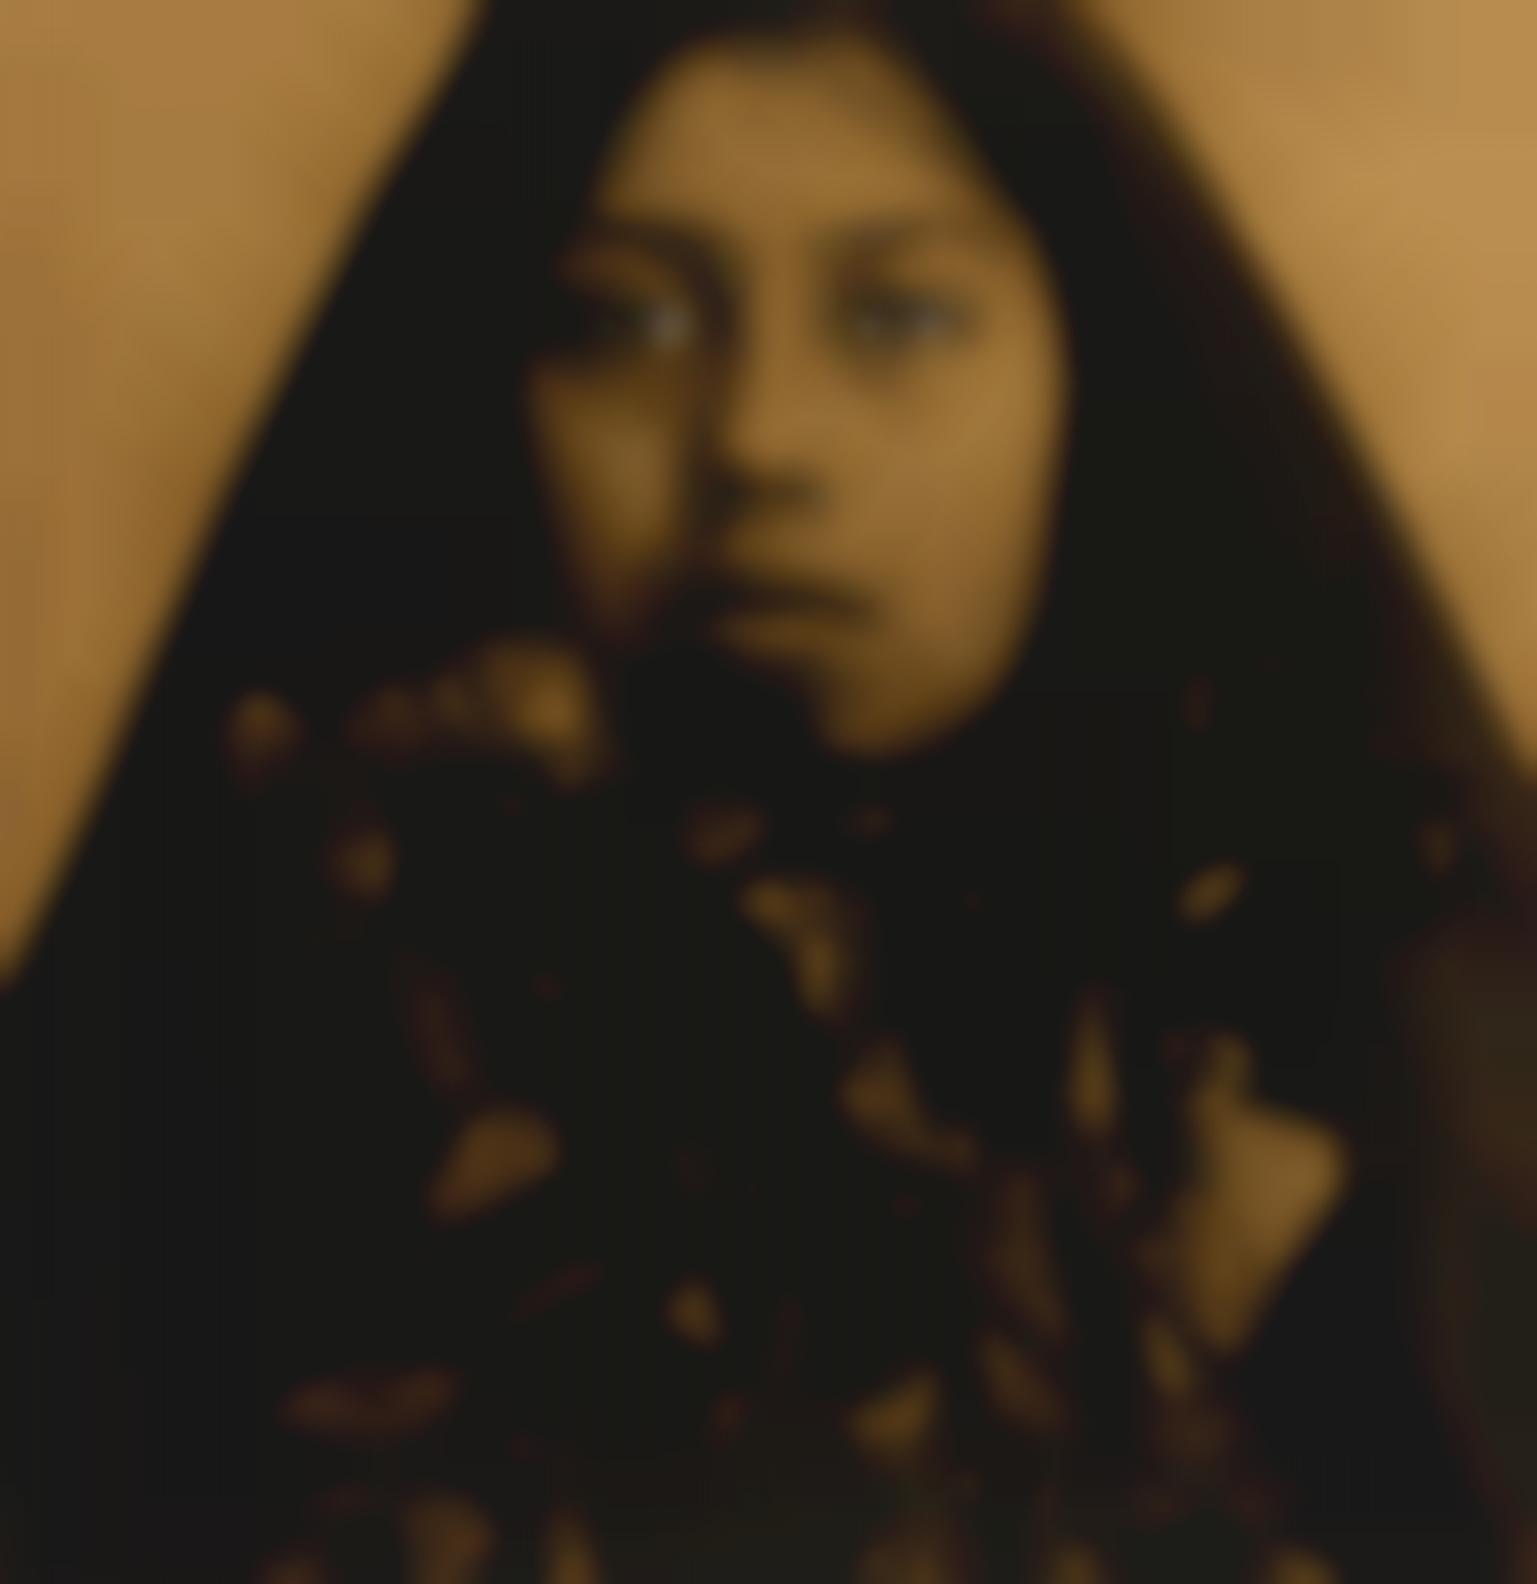 Luis Gonzalez Palma-Rostro De La Esperanza-1989